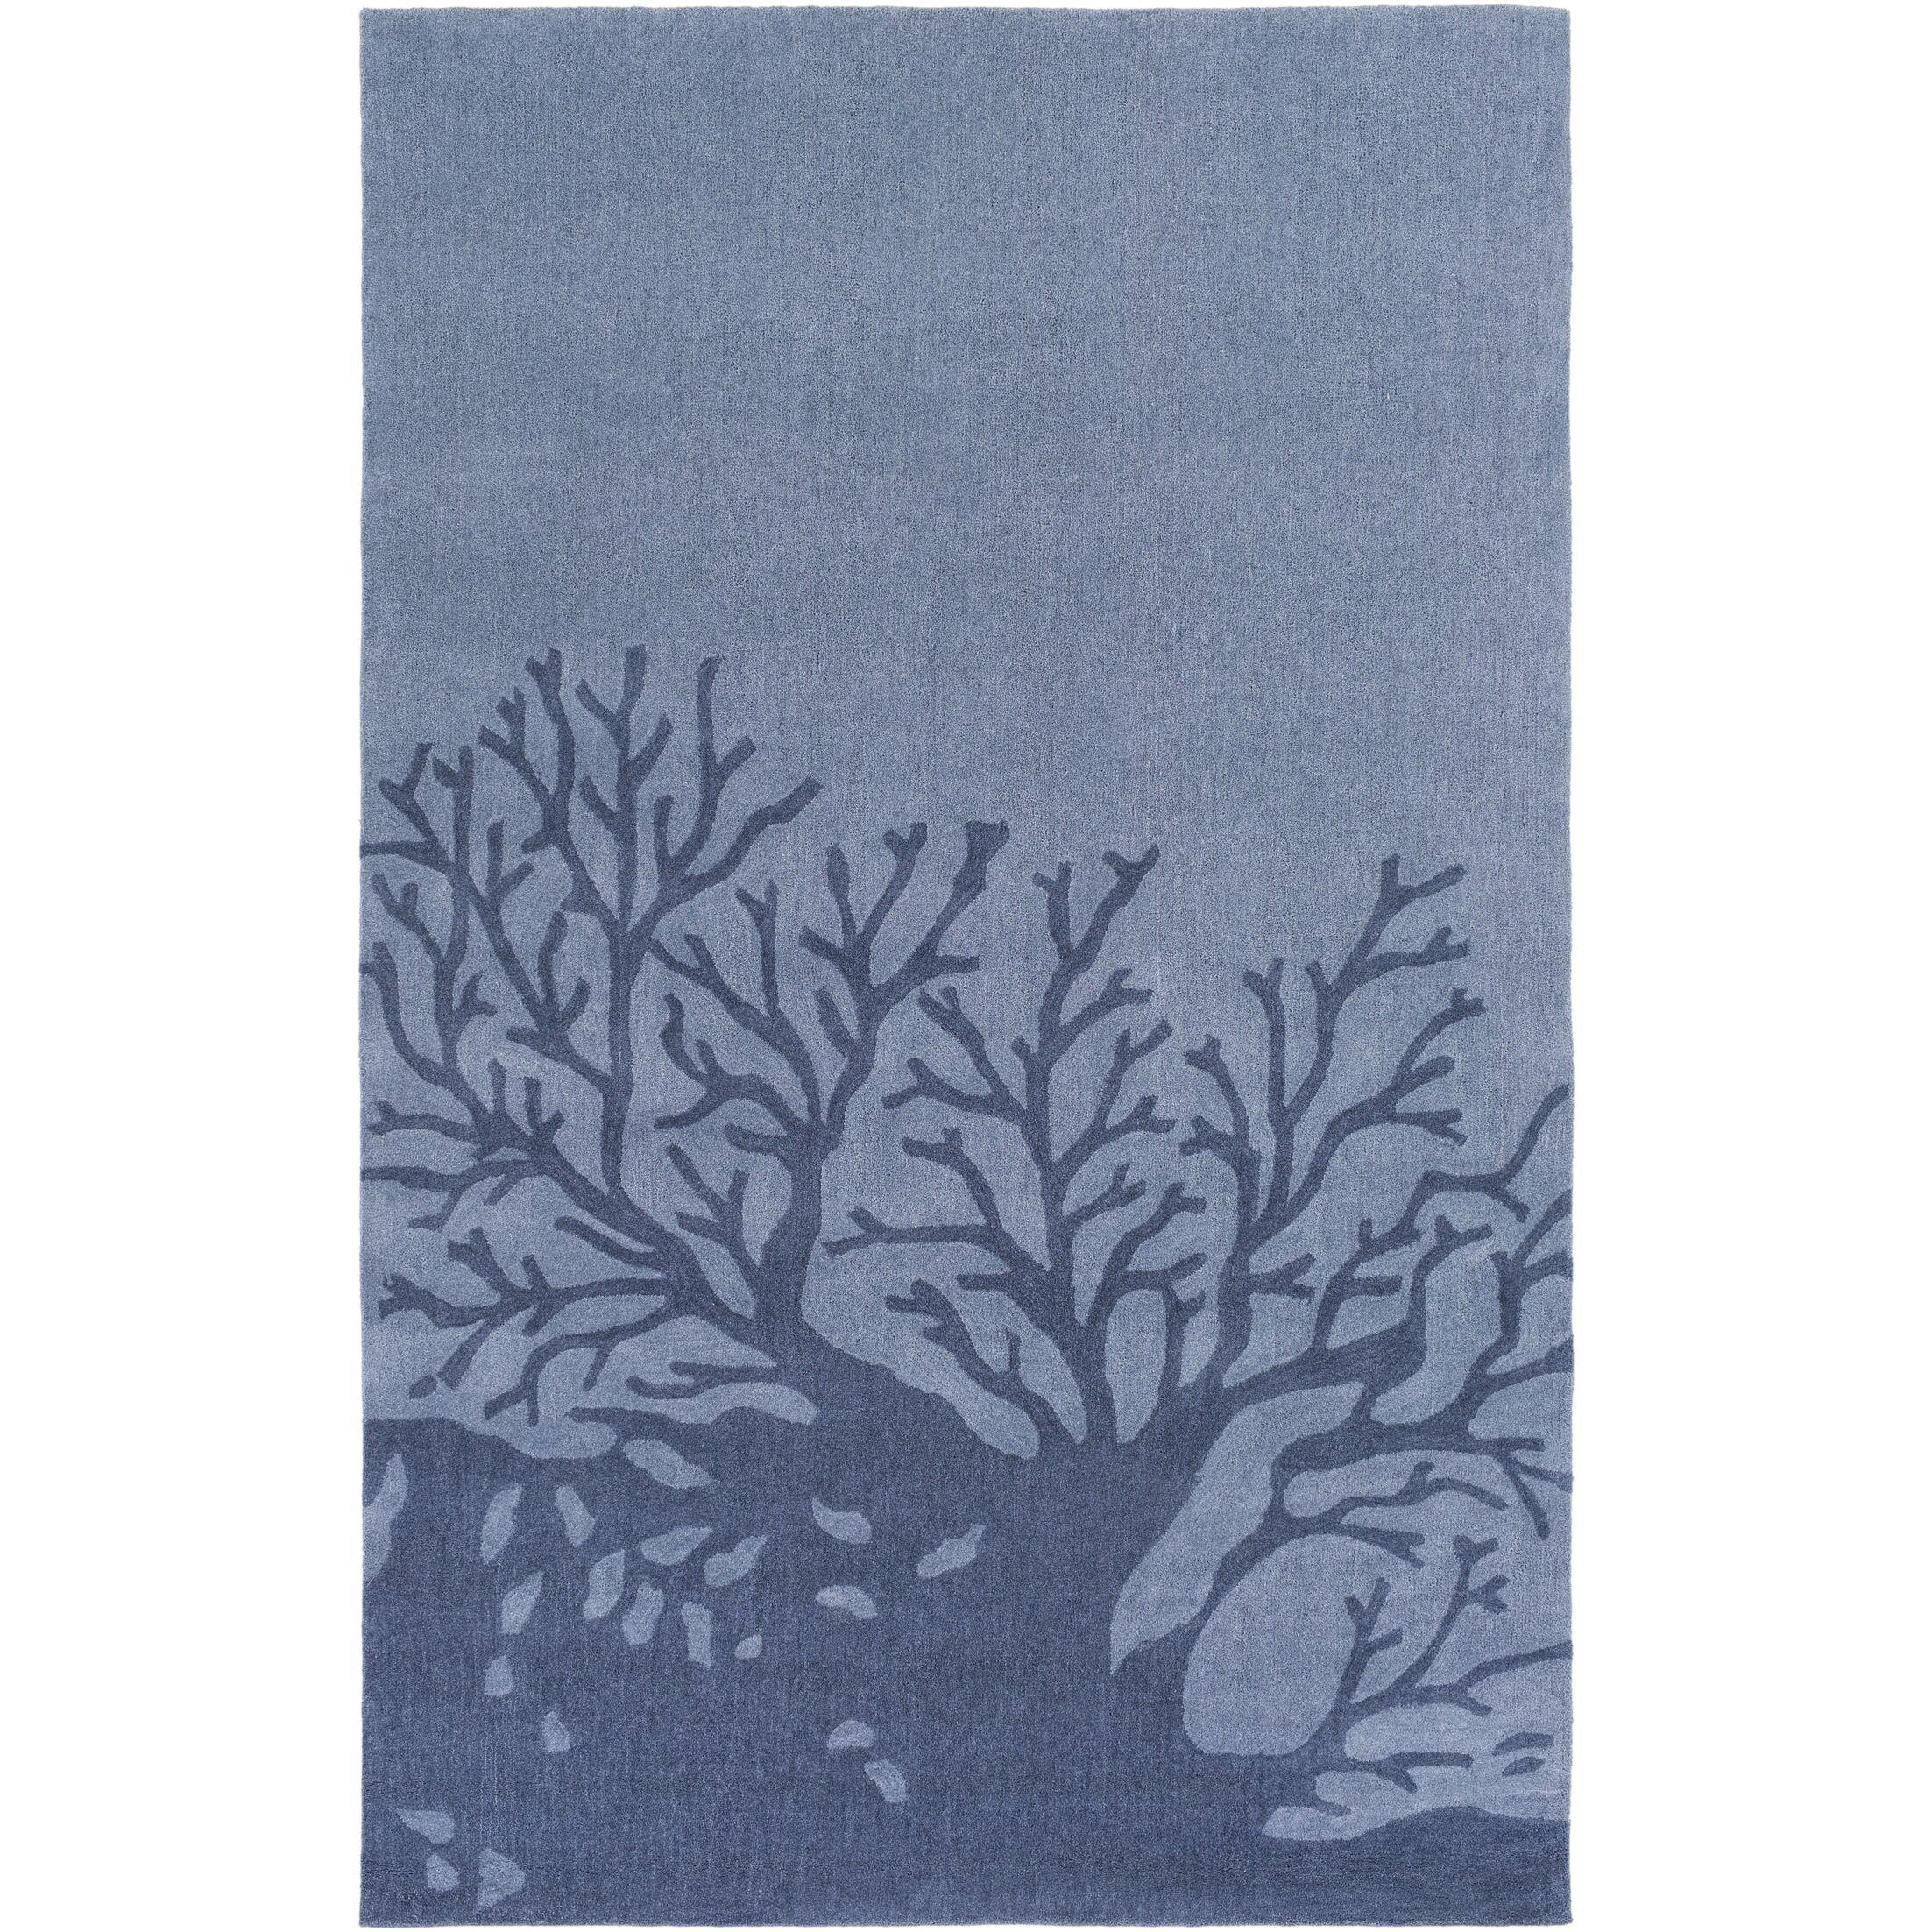 Charlestown Hand-Tufted Denim/Navy Area Rug Rug Size: Rectangle 8' x 10'